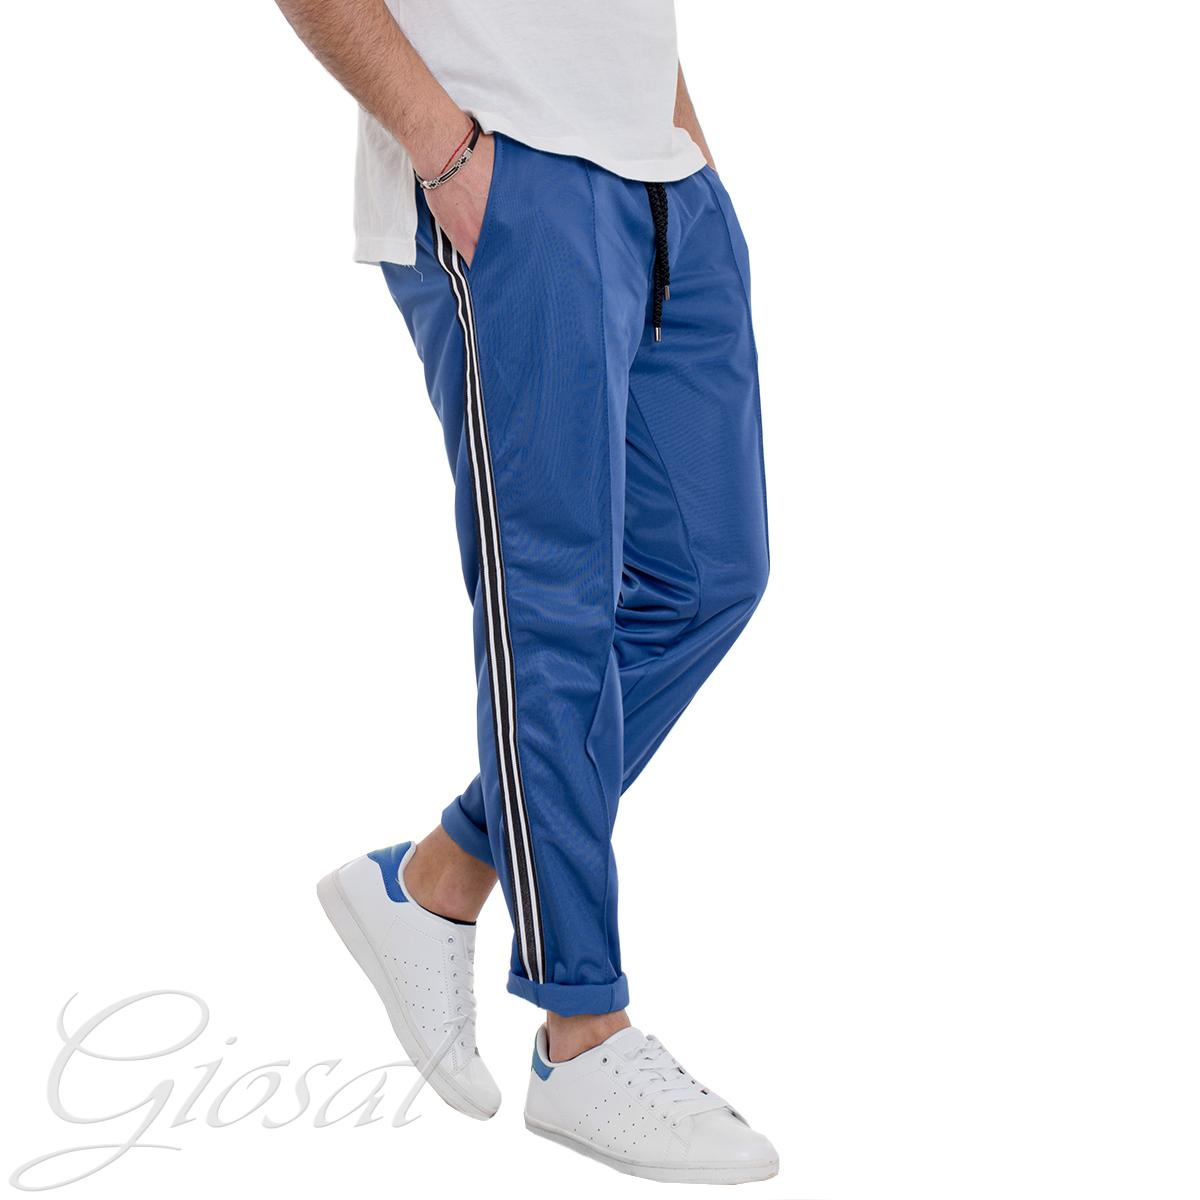 MOD GIOSAL de homme lignes Costume T1165A confort Casual Sport pantalon bleu Royal Relax IgfyYbv76